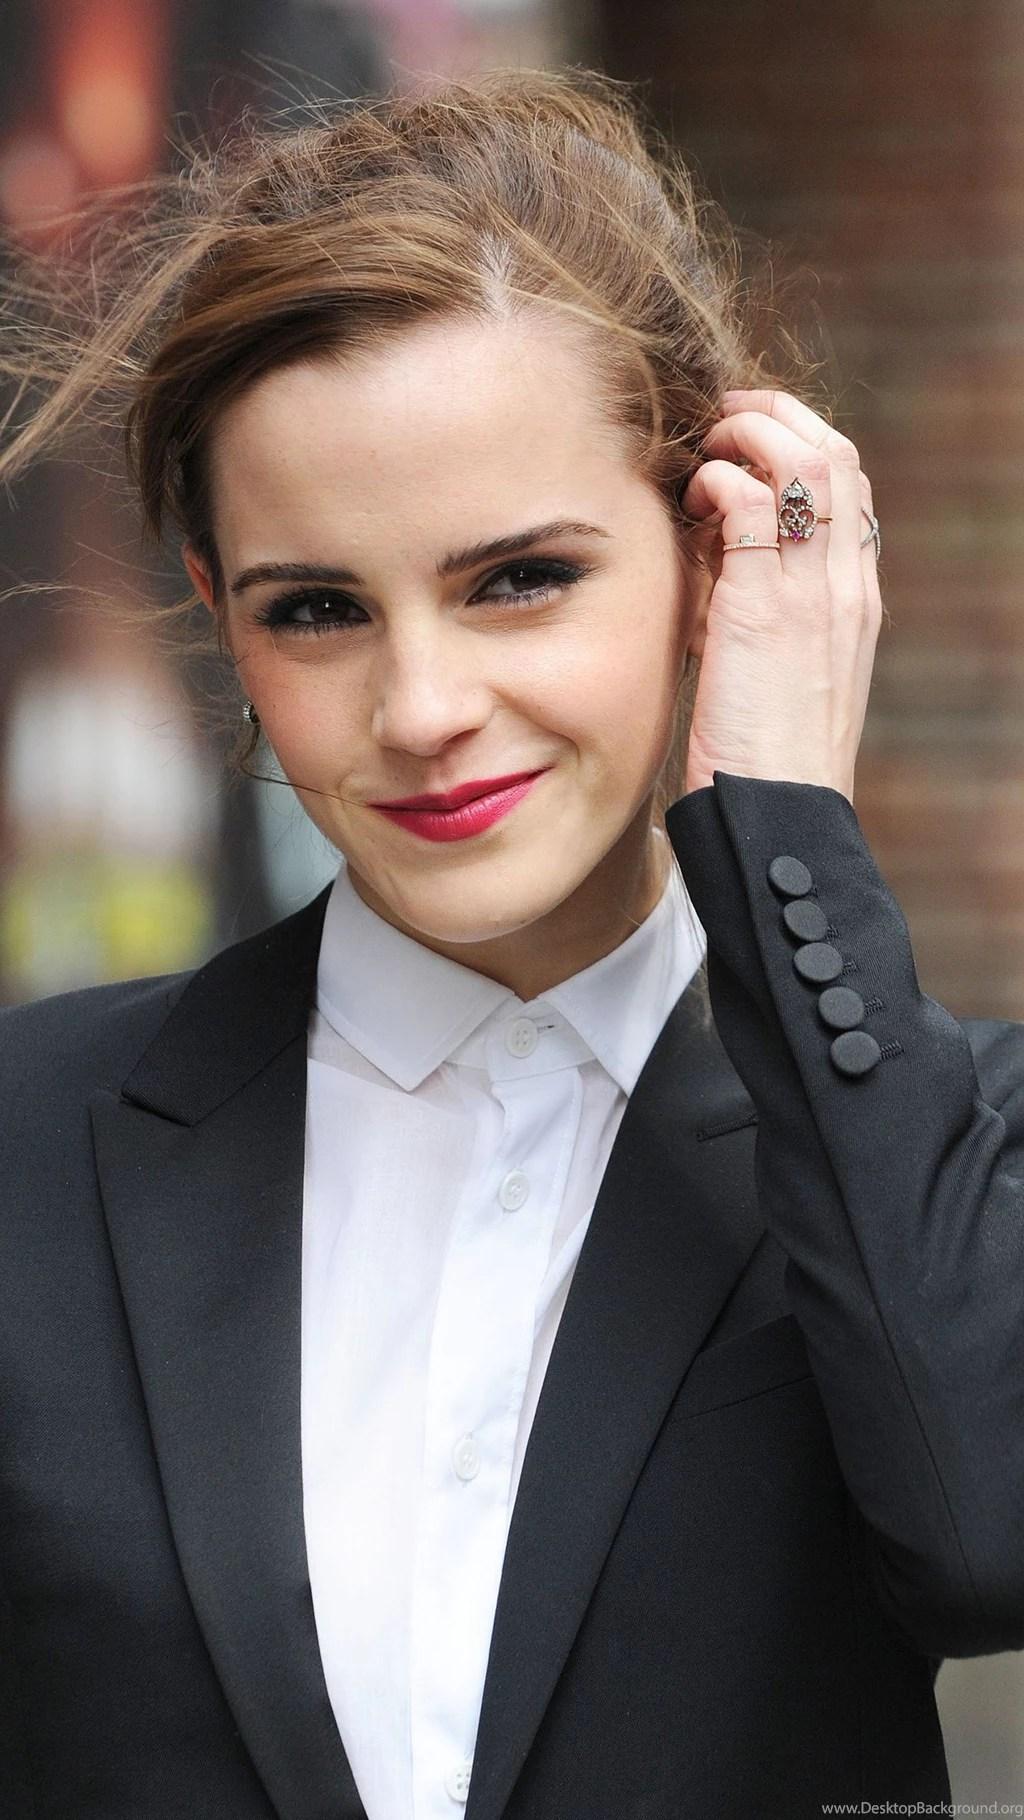 Emma Watson Wallpapers Hd Backgrounds Mobile Iphone 6s